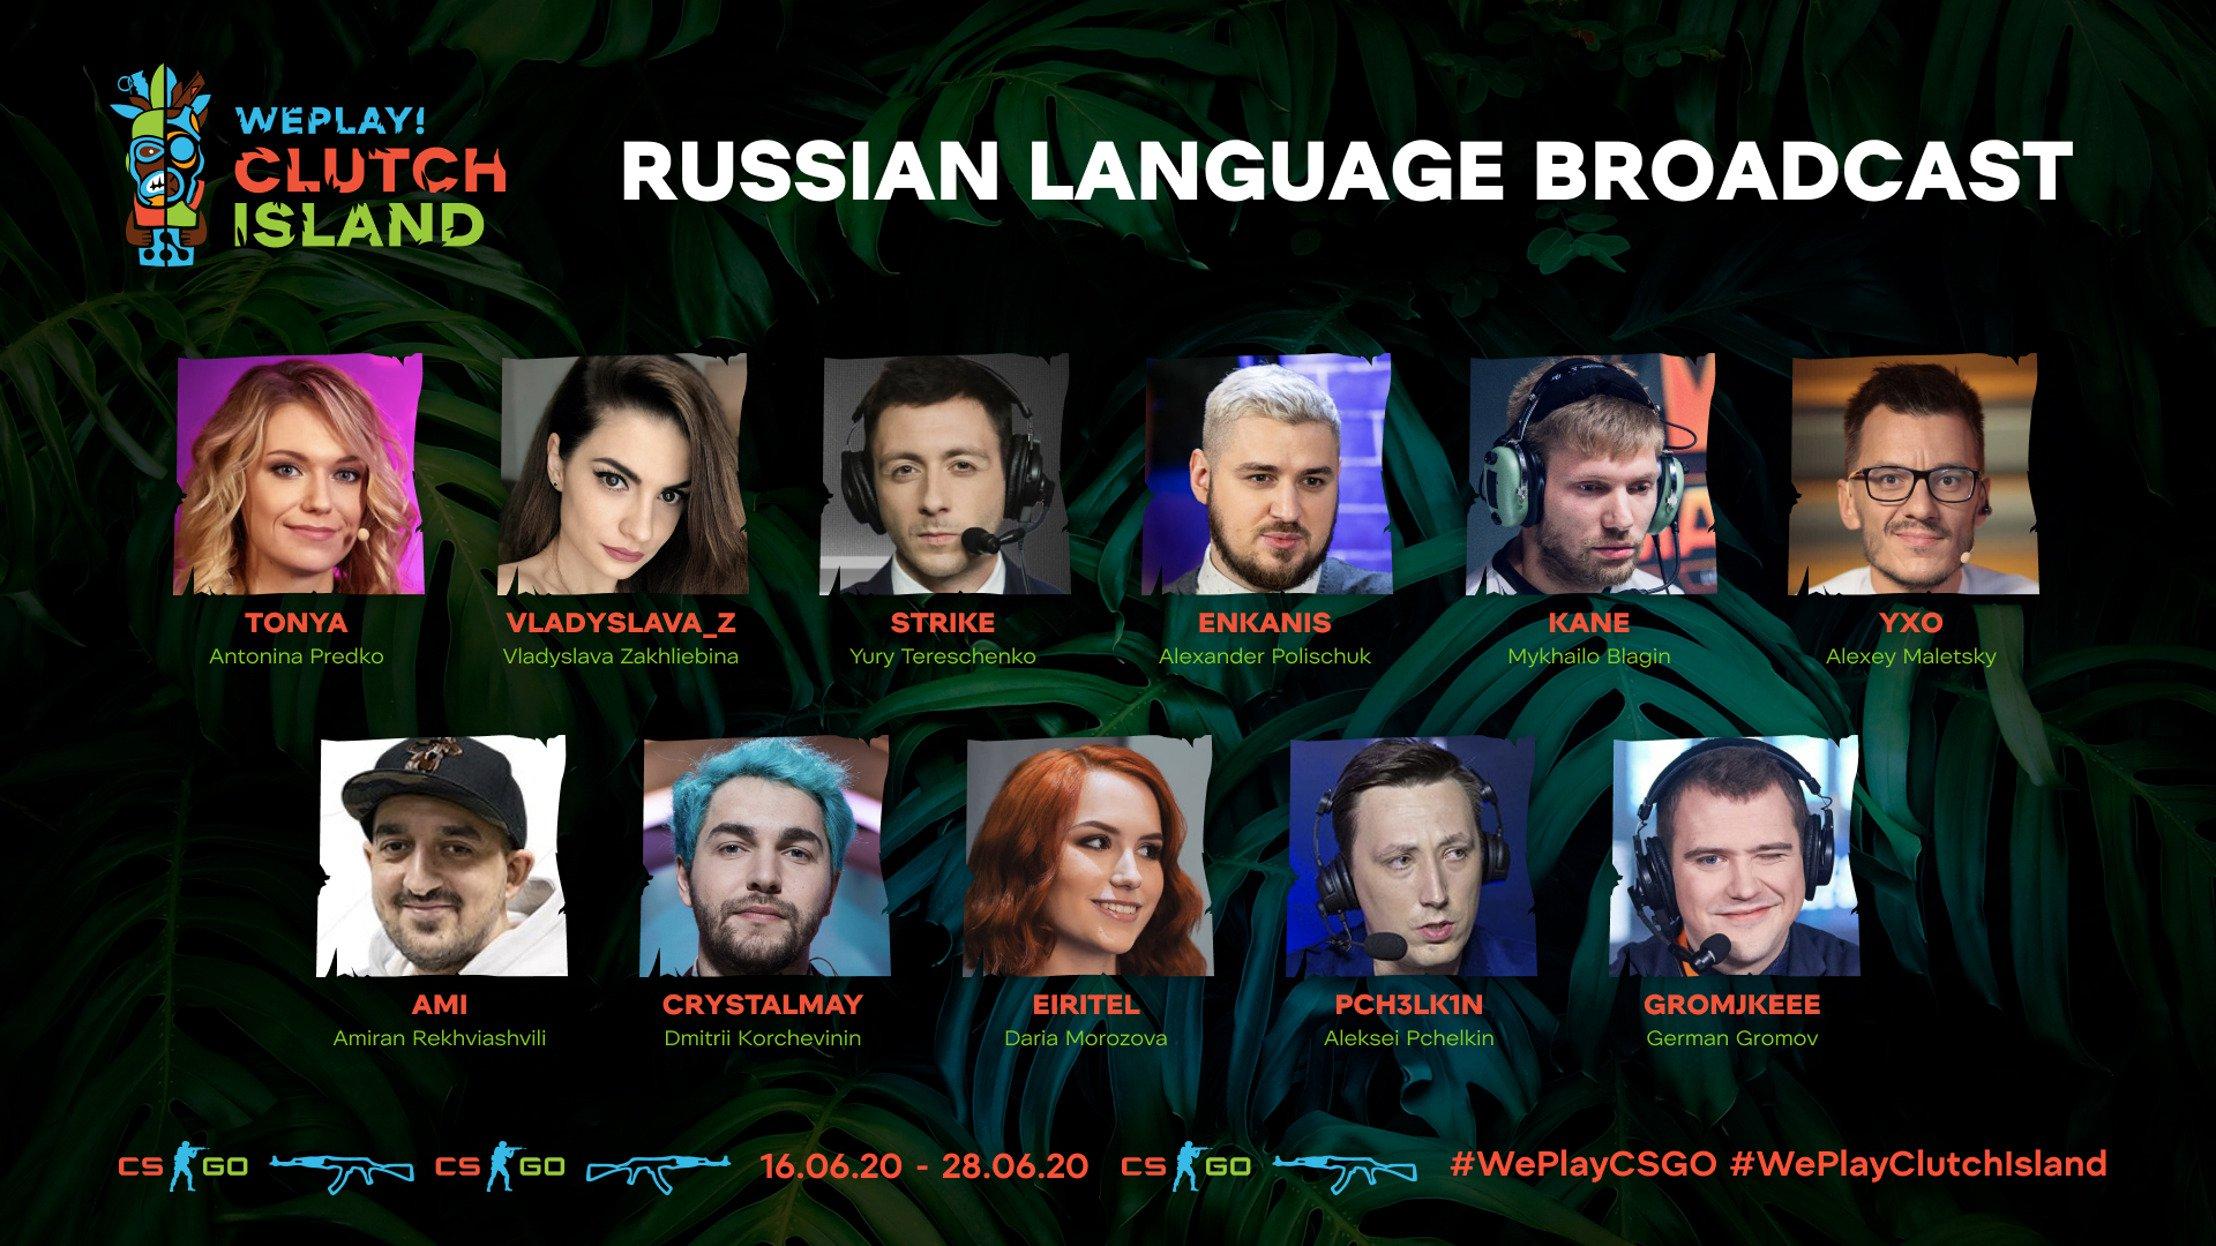 WePlay! Clutch Island Russian-speaking talents